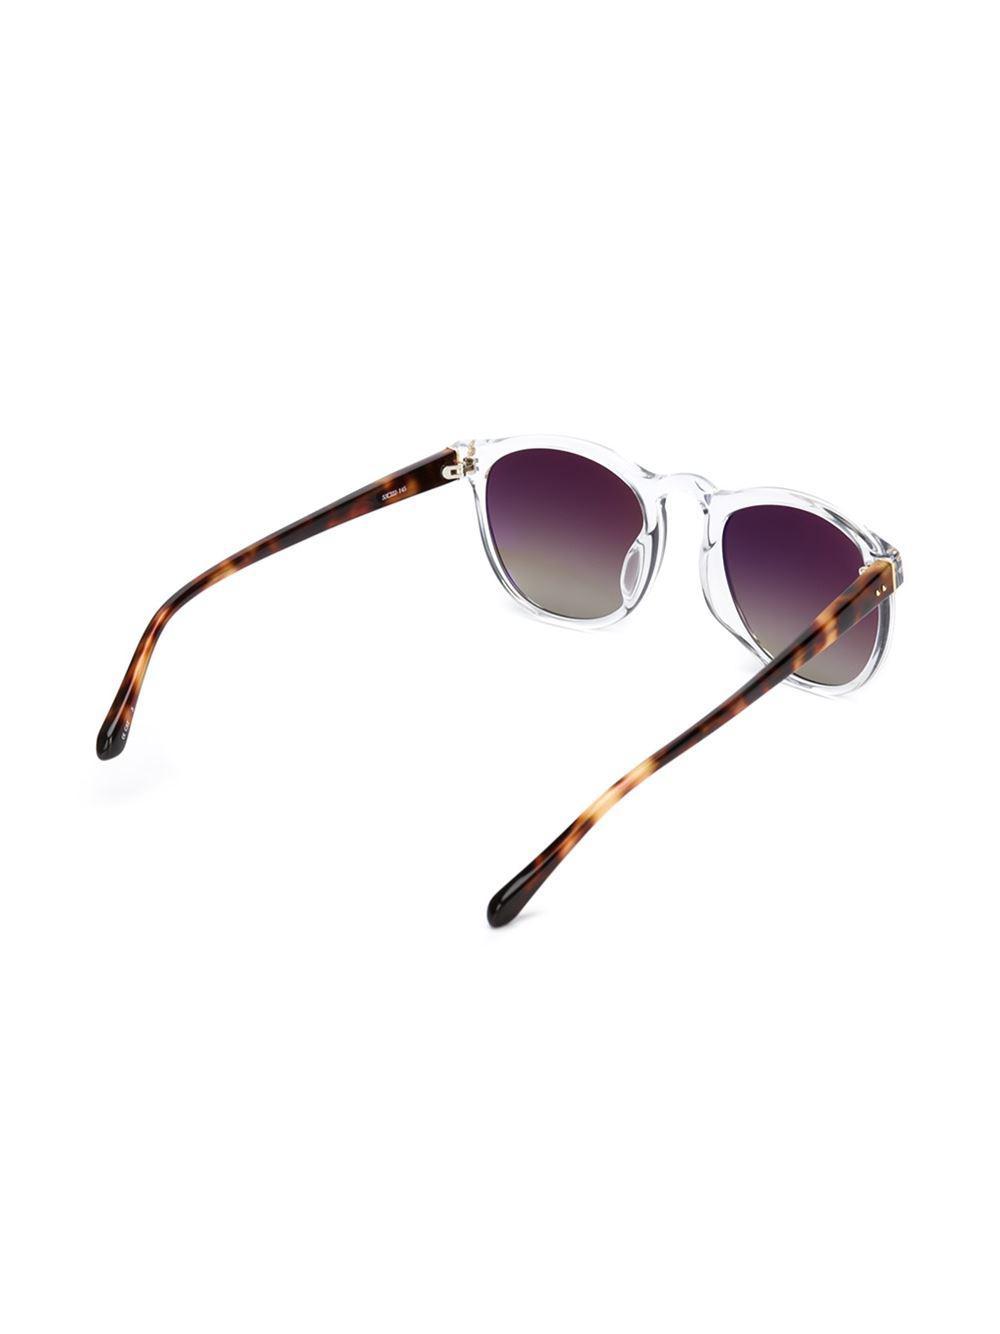 Linda Farrow Square Frames Sunglasses in White (Brown)